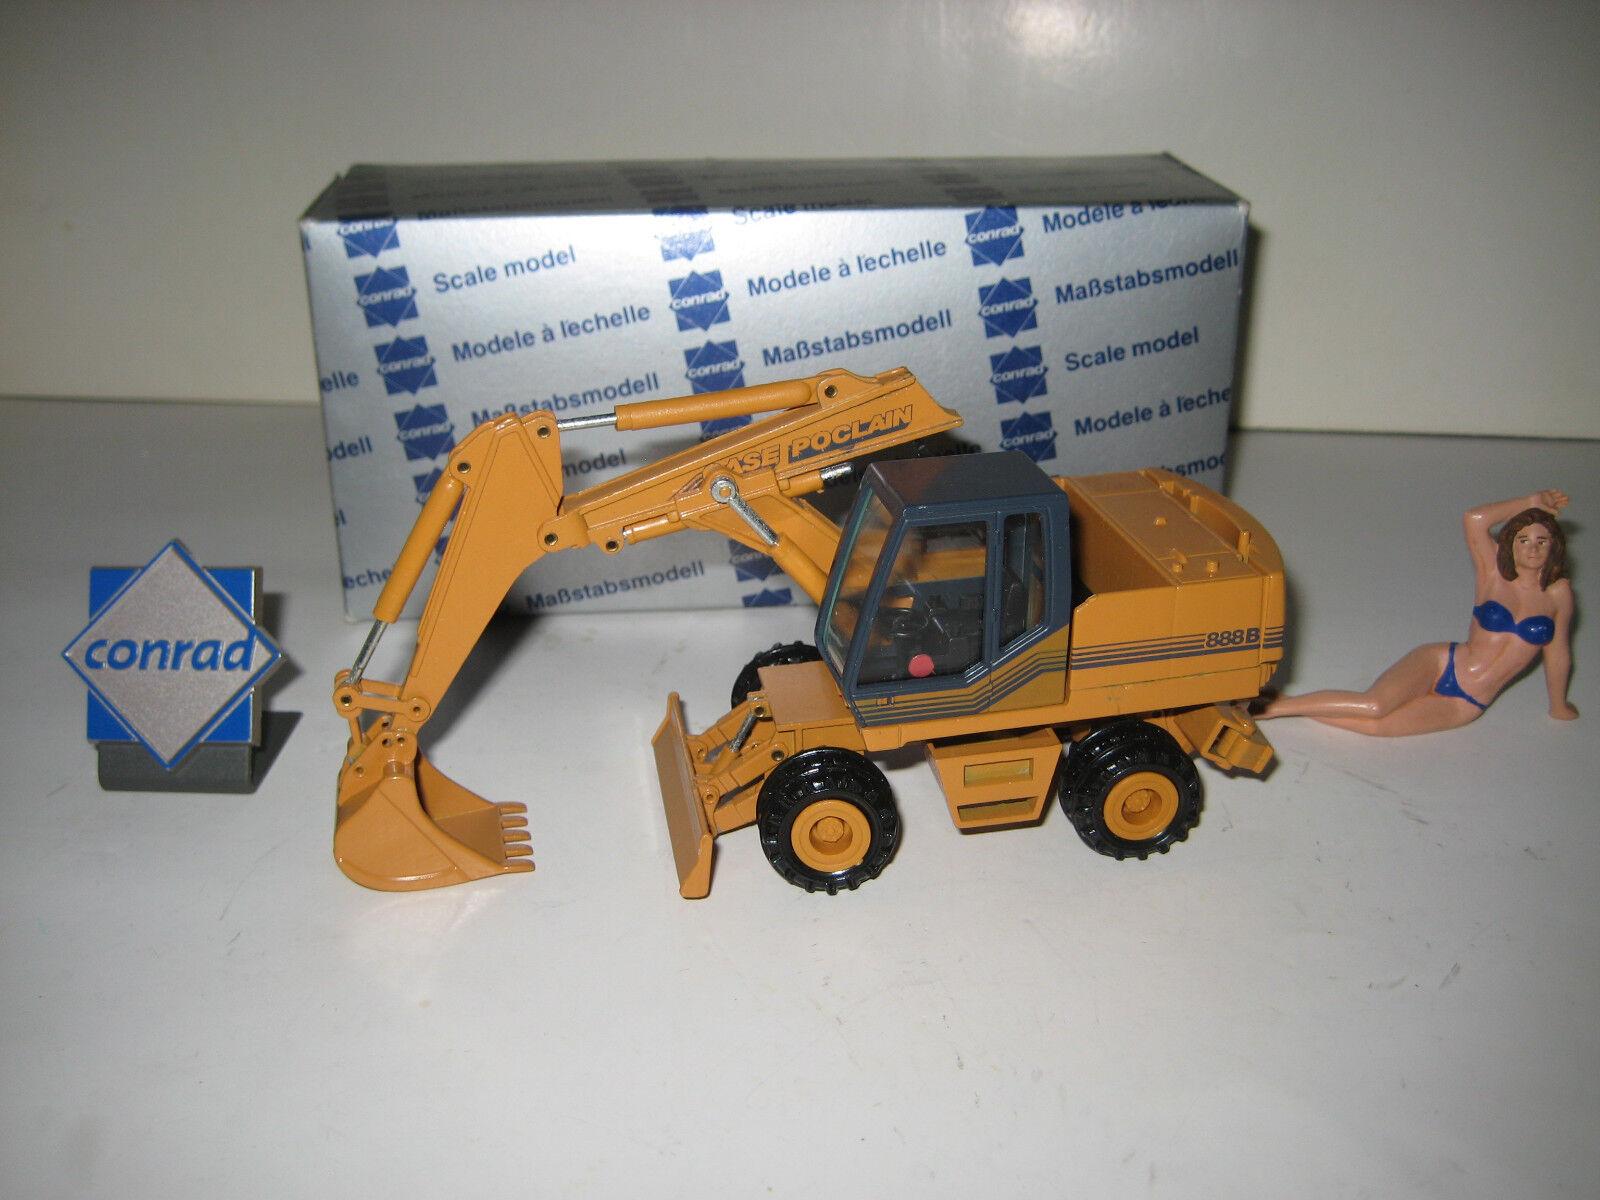 CASE POCLAIN 888 B Excavateurs tieflöffel mobile  2893.4 CONRAD 1 50 NEUF dans sa boîte RARE